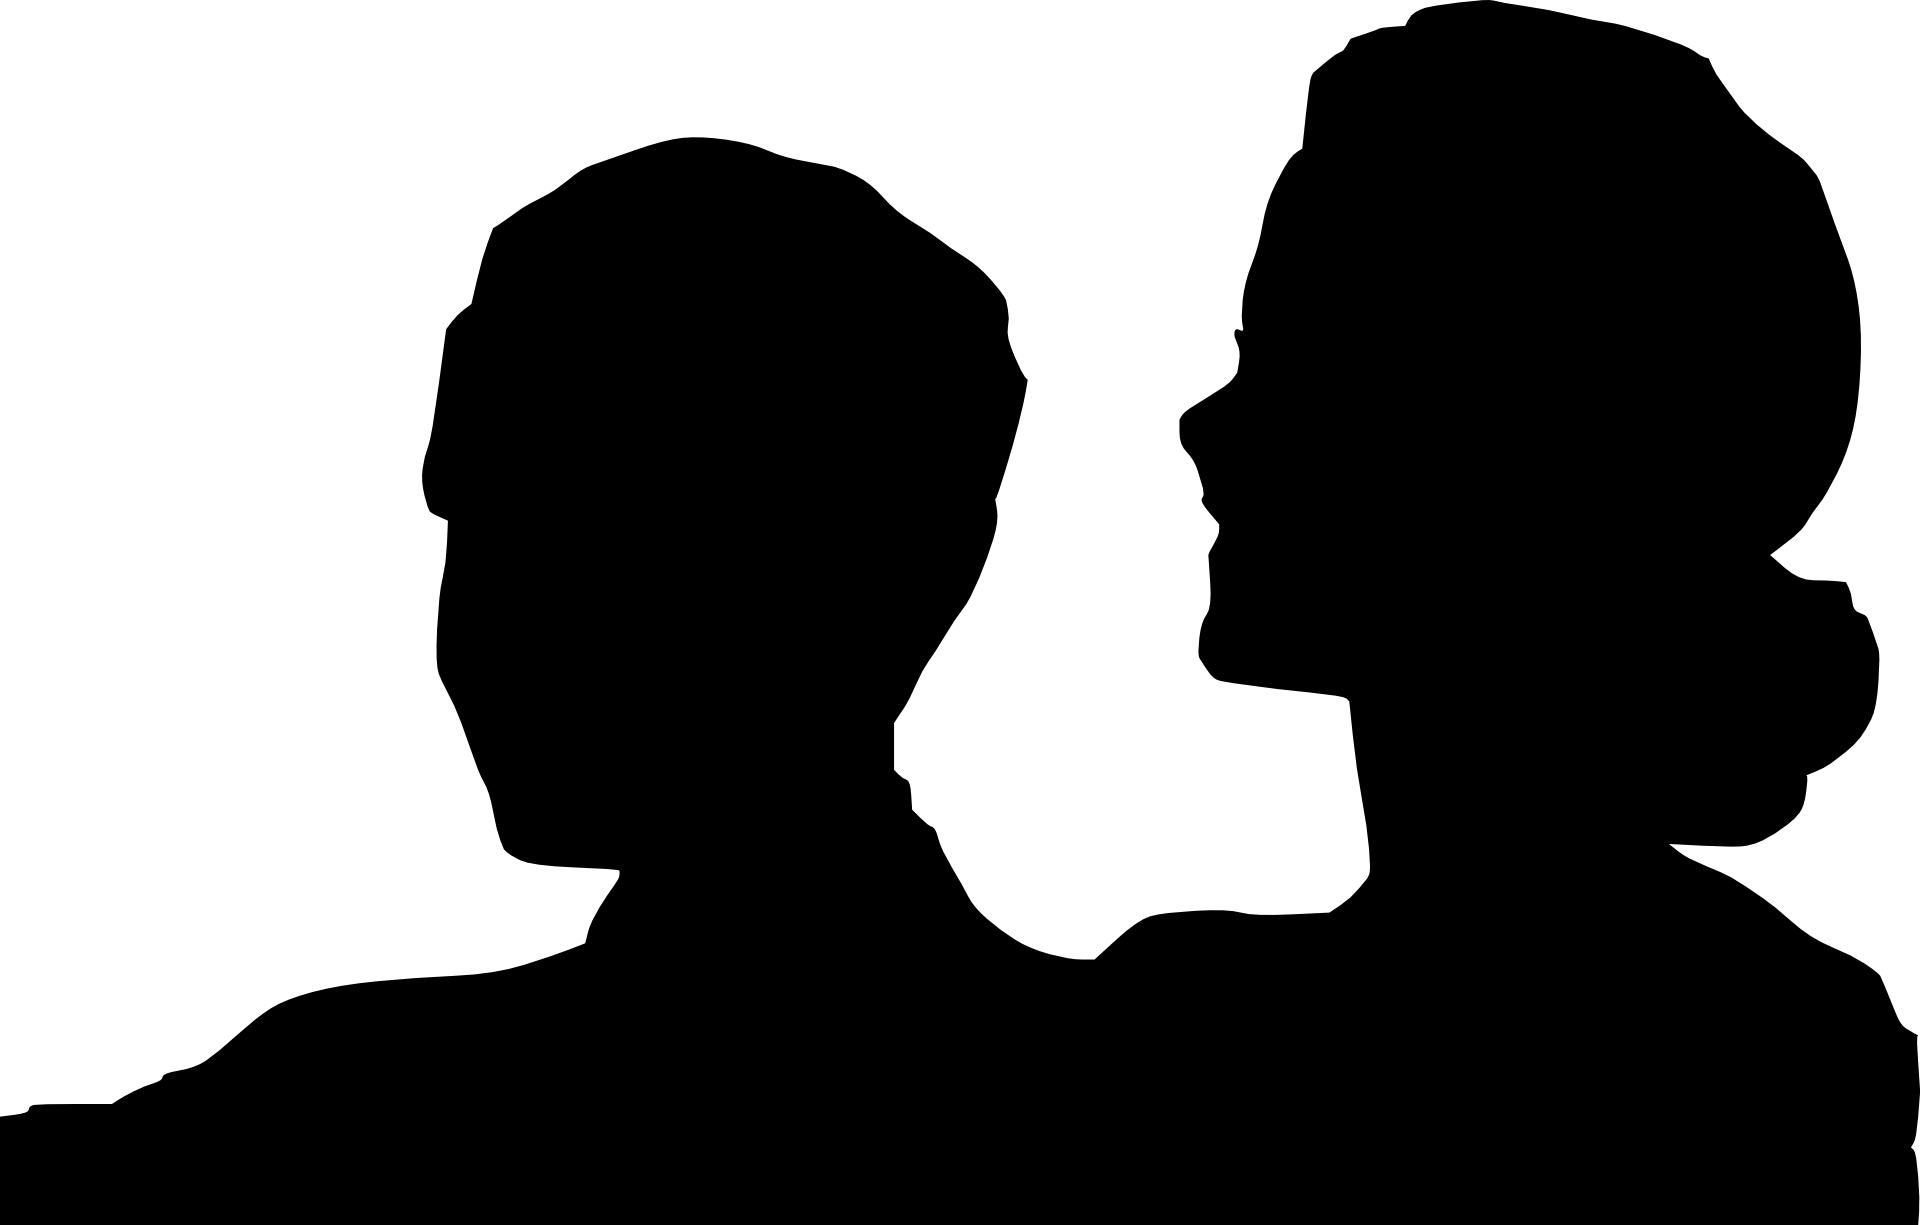 bb4832cc9c2b4650